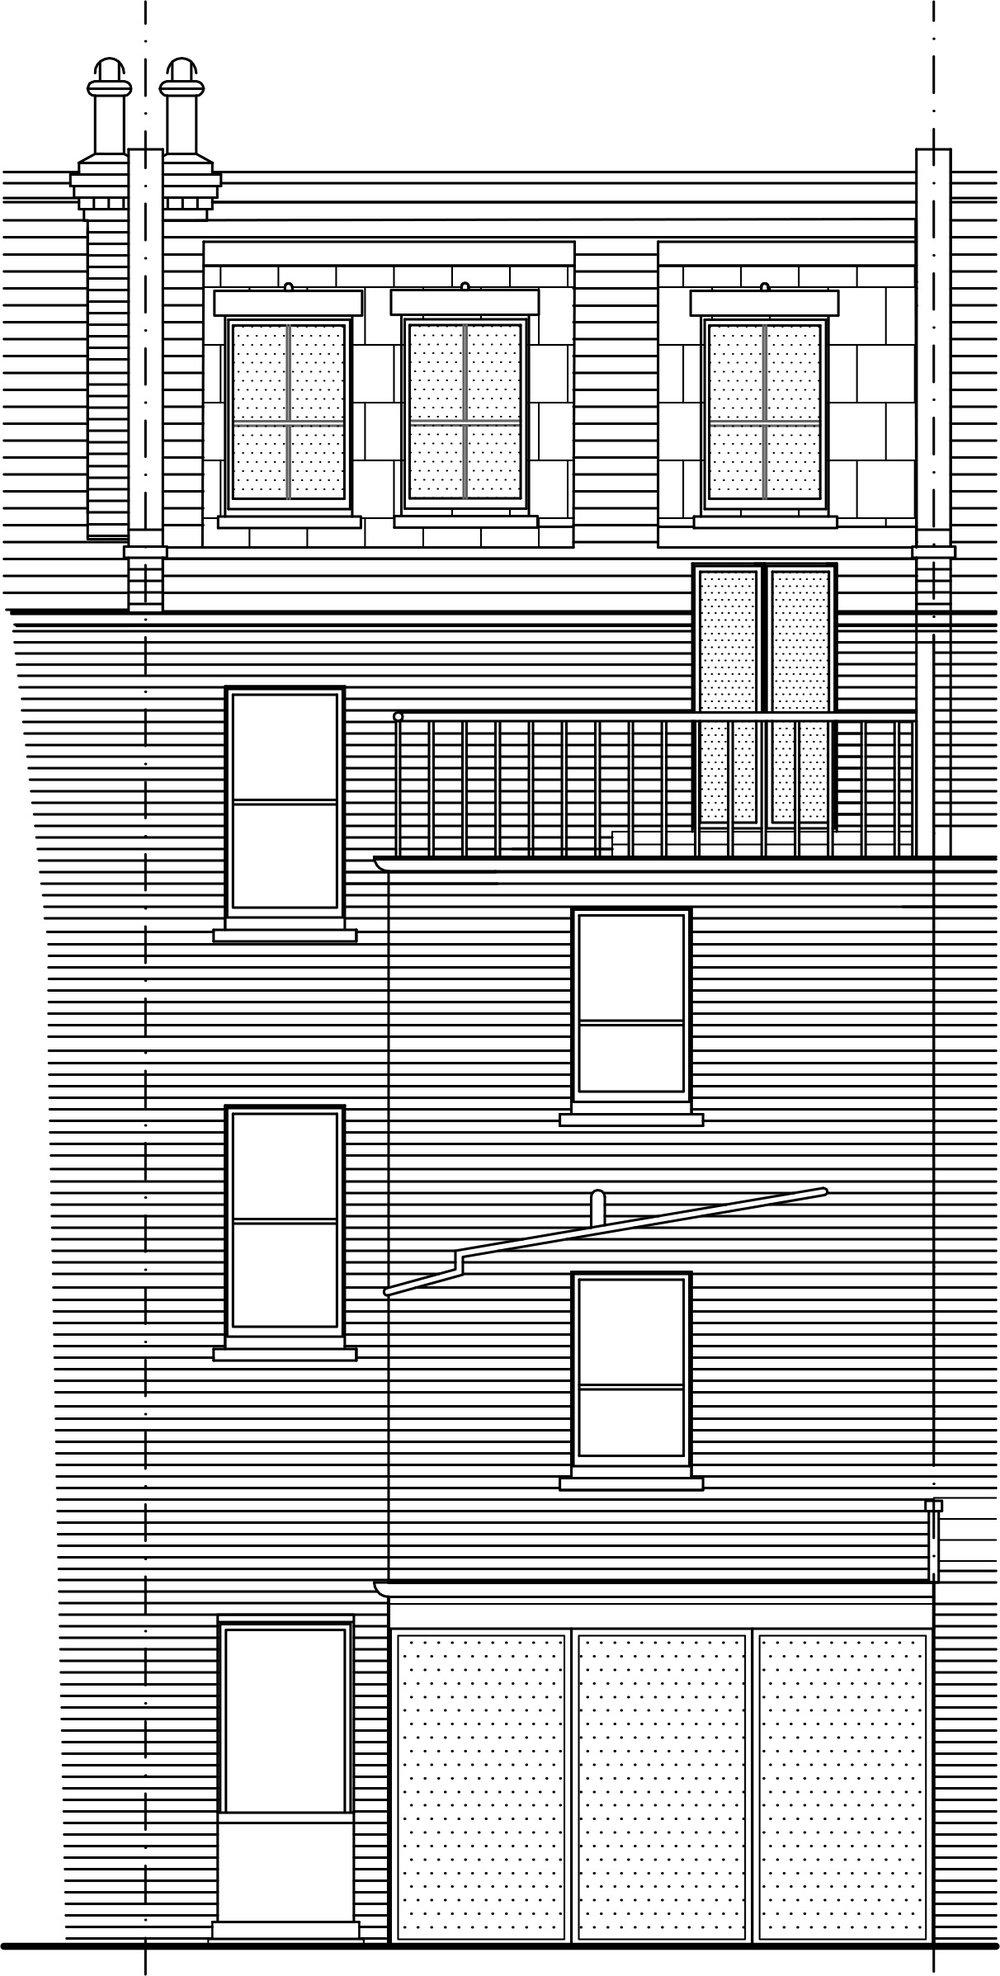 fermoy elevation 1.jpg